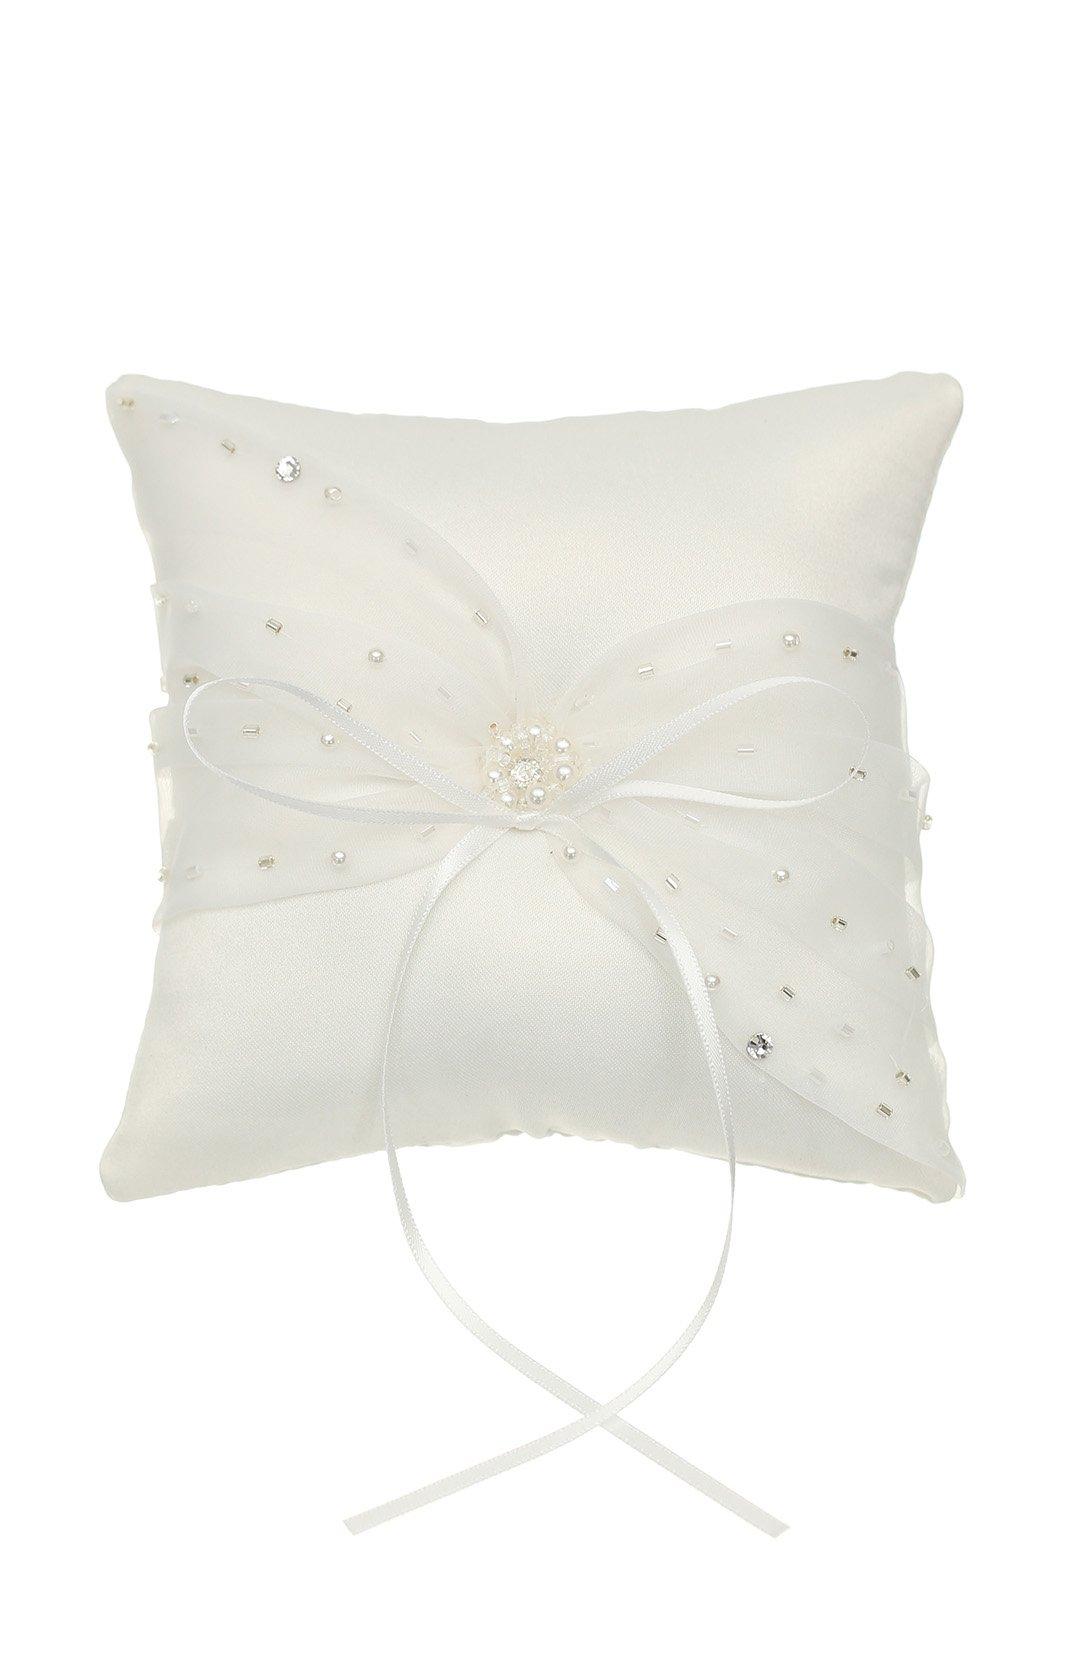 SAMKY Venus Jewelry Crystal Beads Lace Bow Wedding Ring Bearer Pillow 5 Inch x 5 Inch - Ivory RP011I by SAMKY